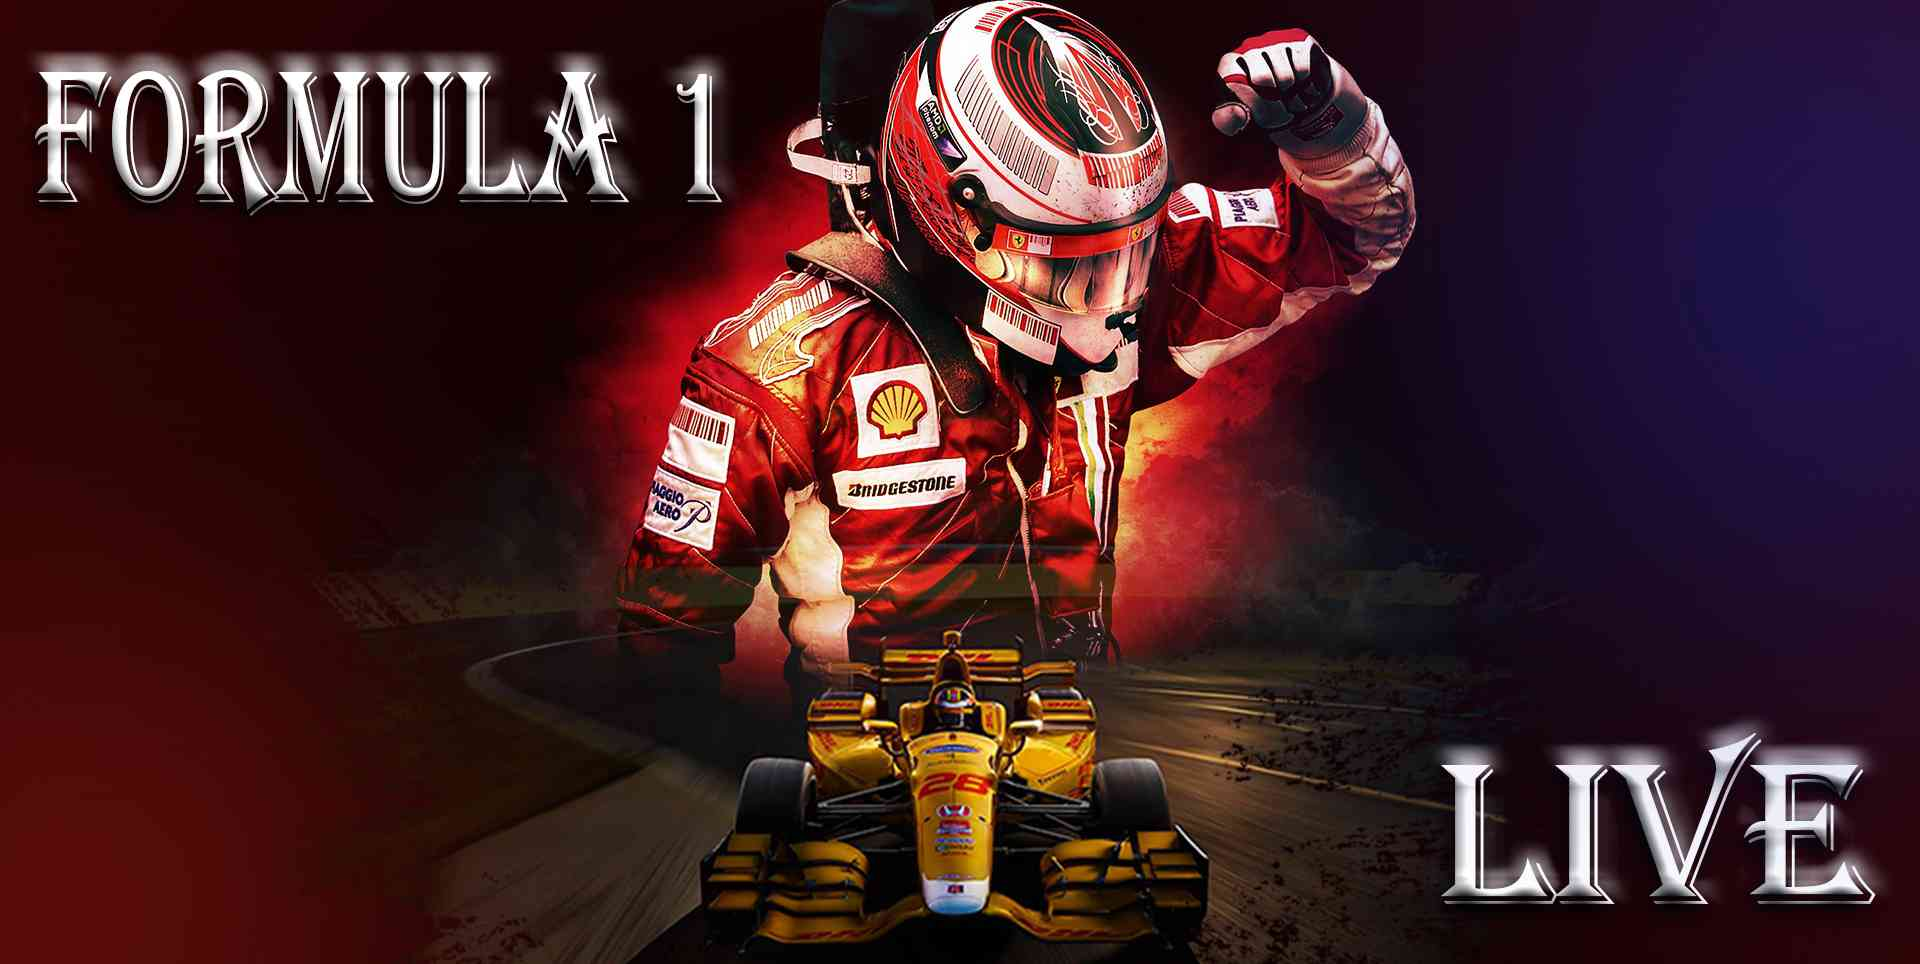 adac-formula-4-championship-online